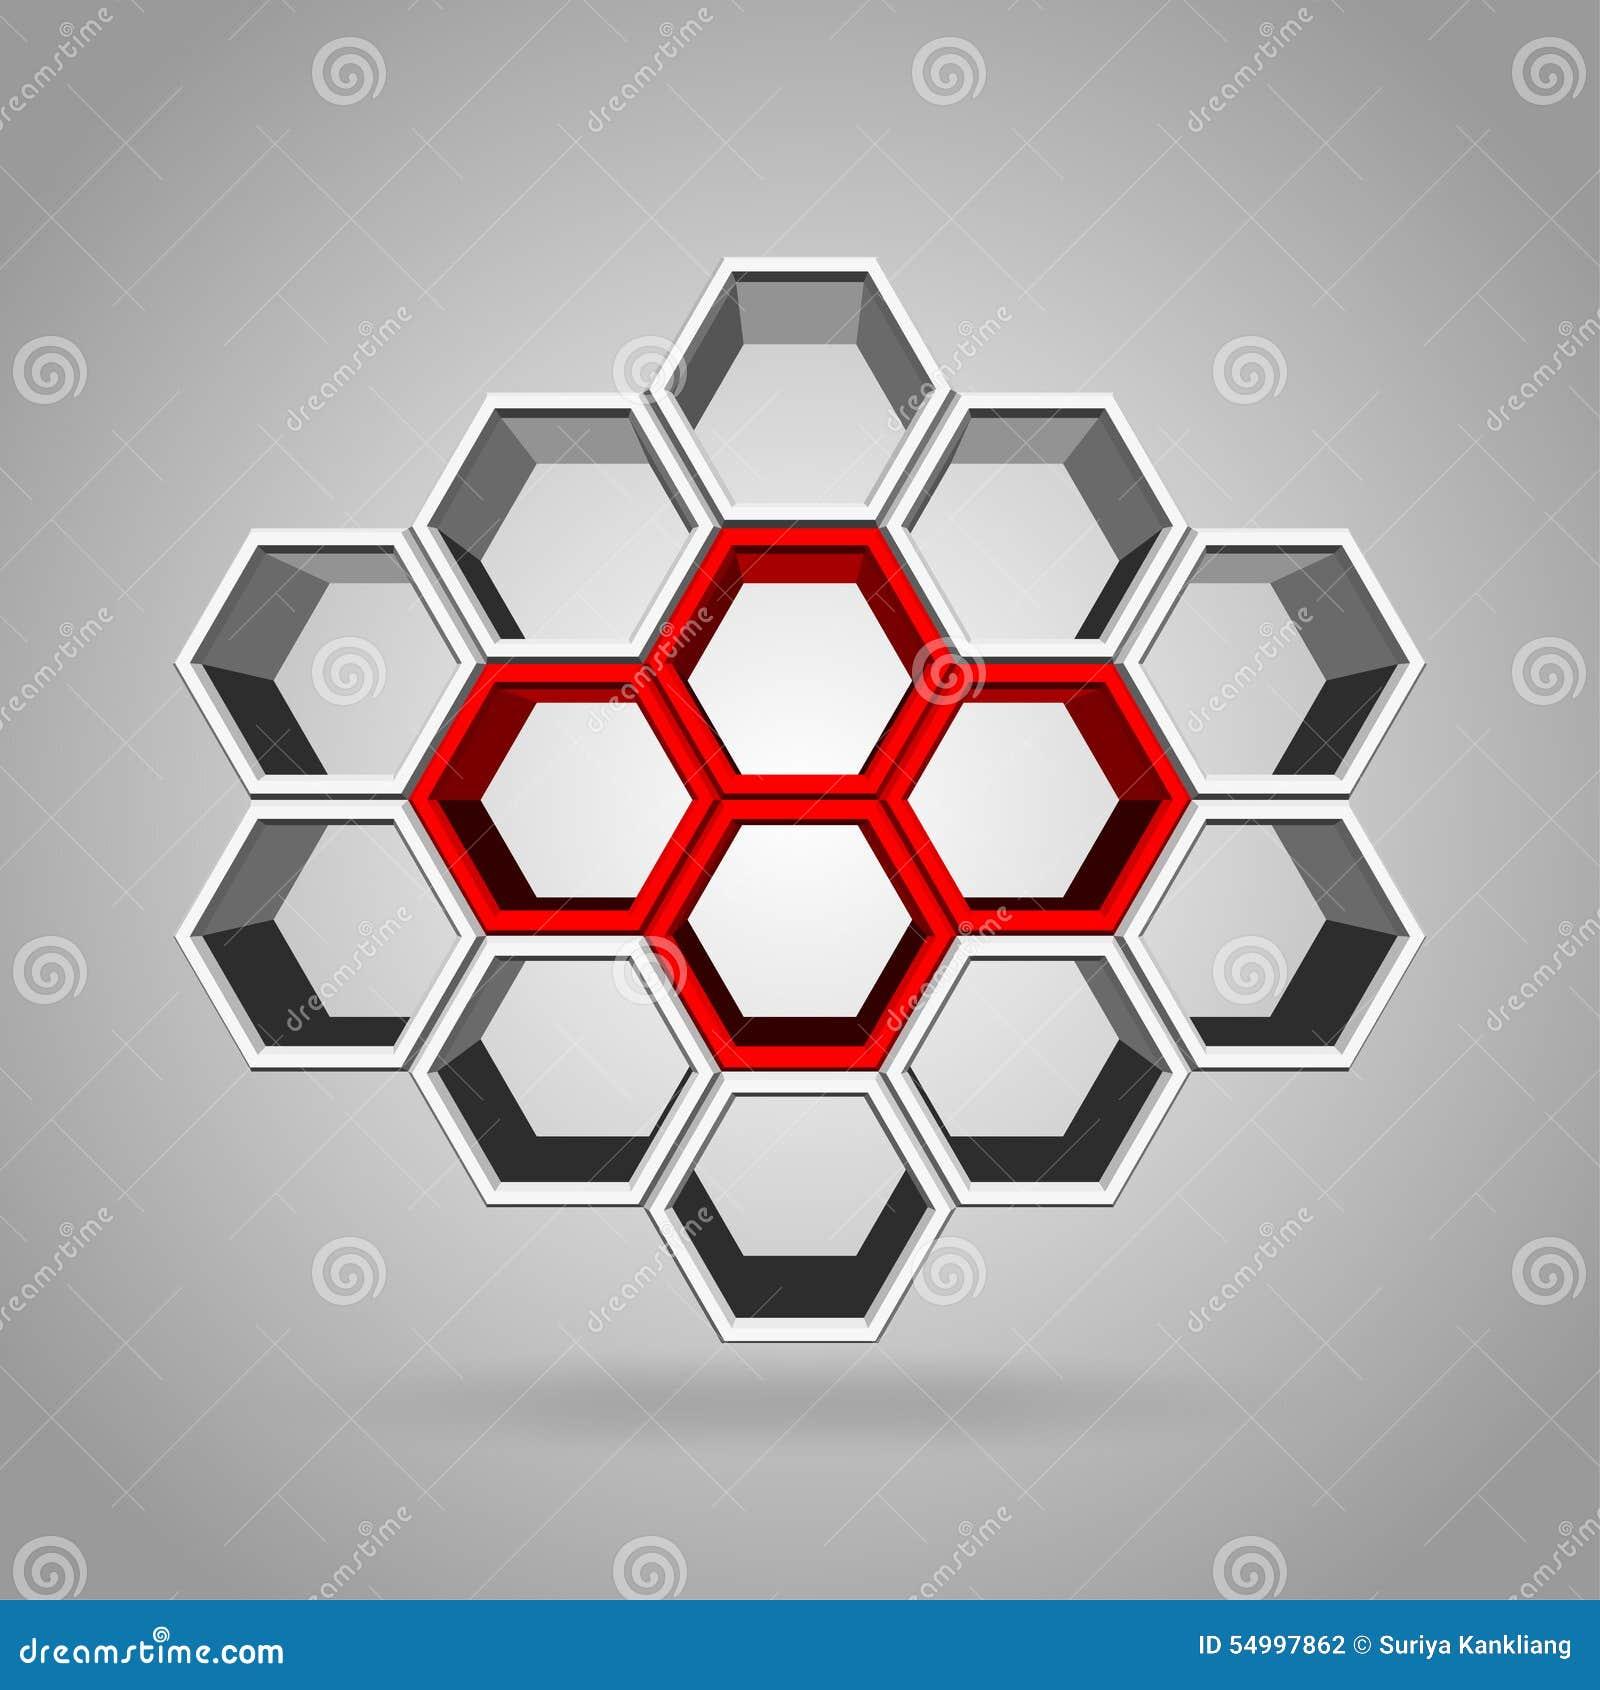 3d hexagon pattern stock vector image 54997696 - 3d Hexagon Pattern Stock Photography